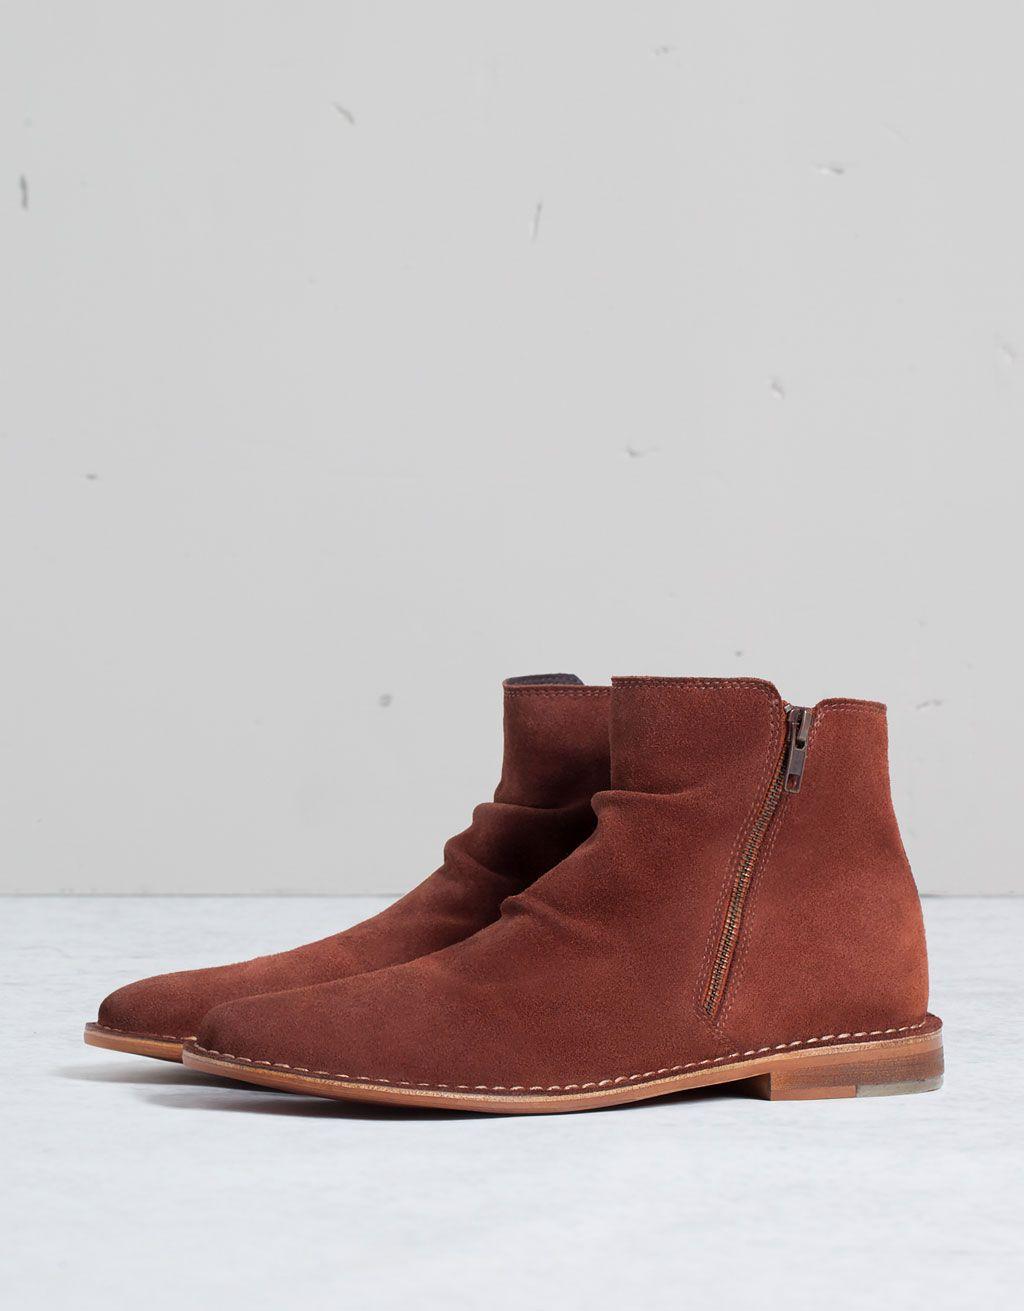 Suede Chelsea Boots In Tan - Tan Bershka Newest PeU9Cqoq